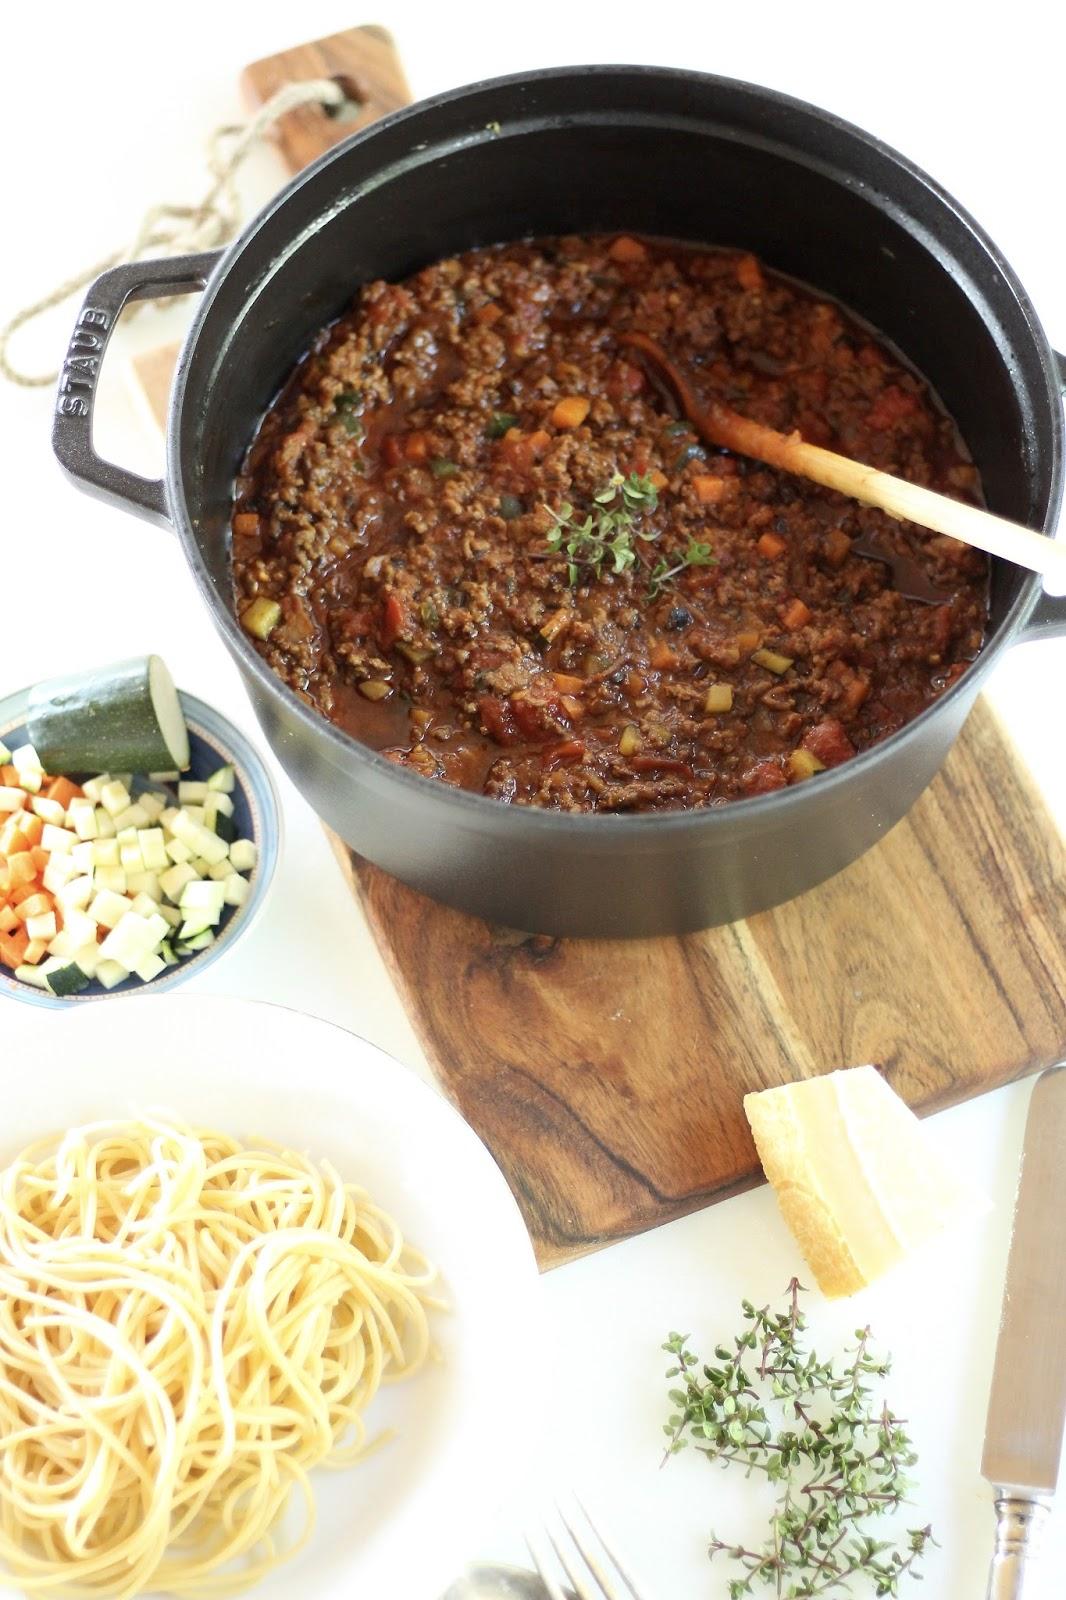 Spaghetti Bolognese à la Yushka - Rezept für die feinste Bolognese!